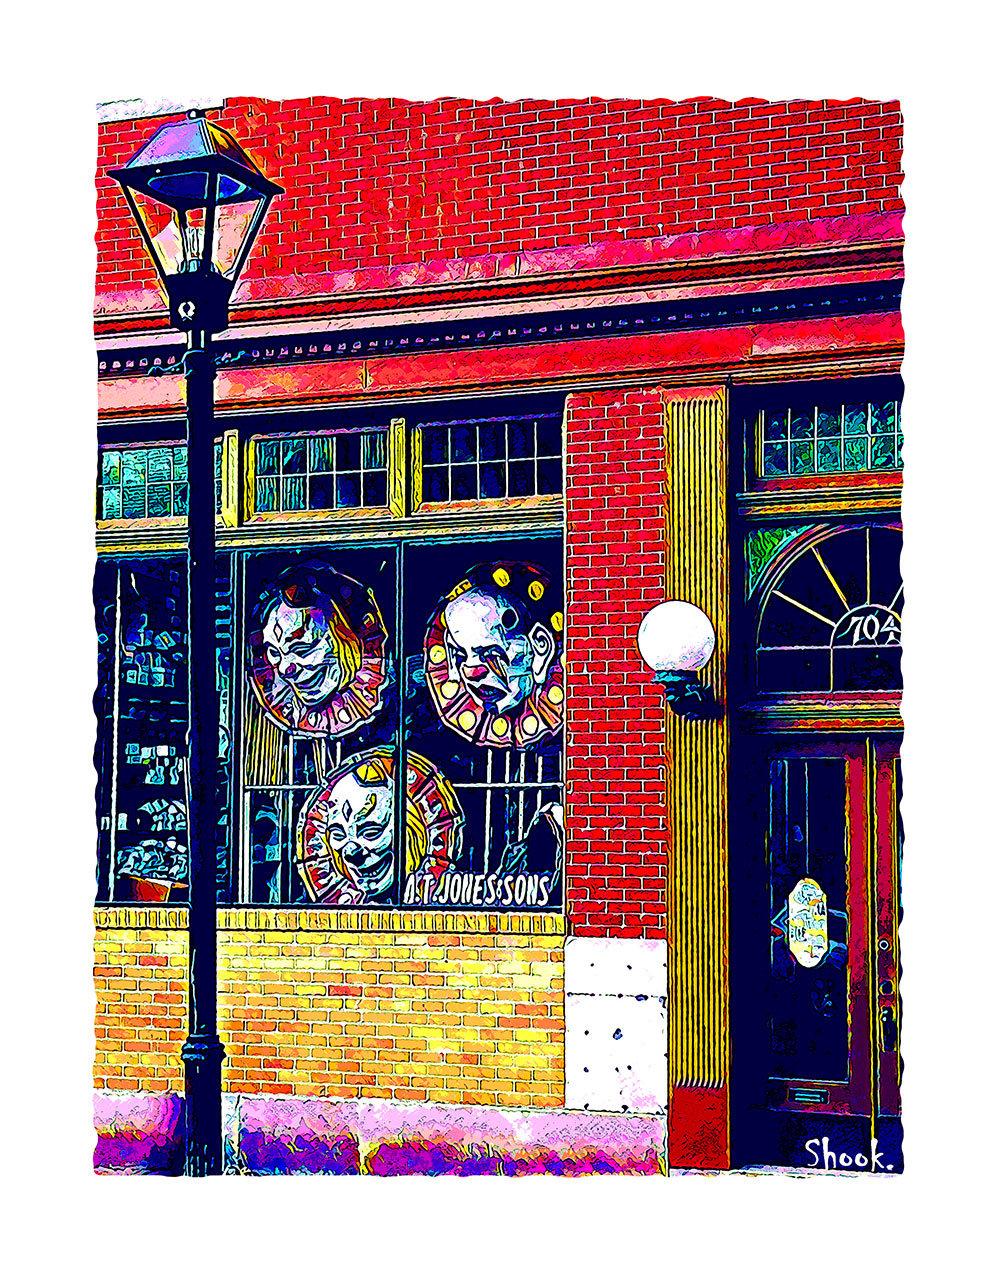 A.T. Jones & Sons, Baltimore MD Giclée Art Print (Multi-size options)